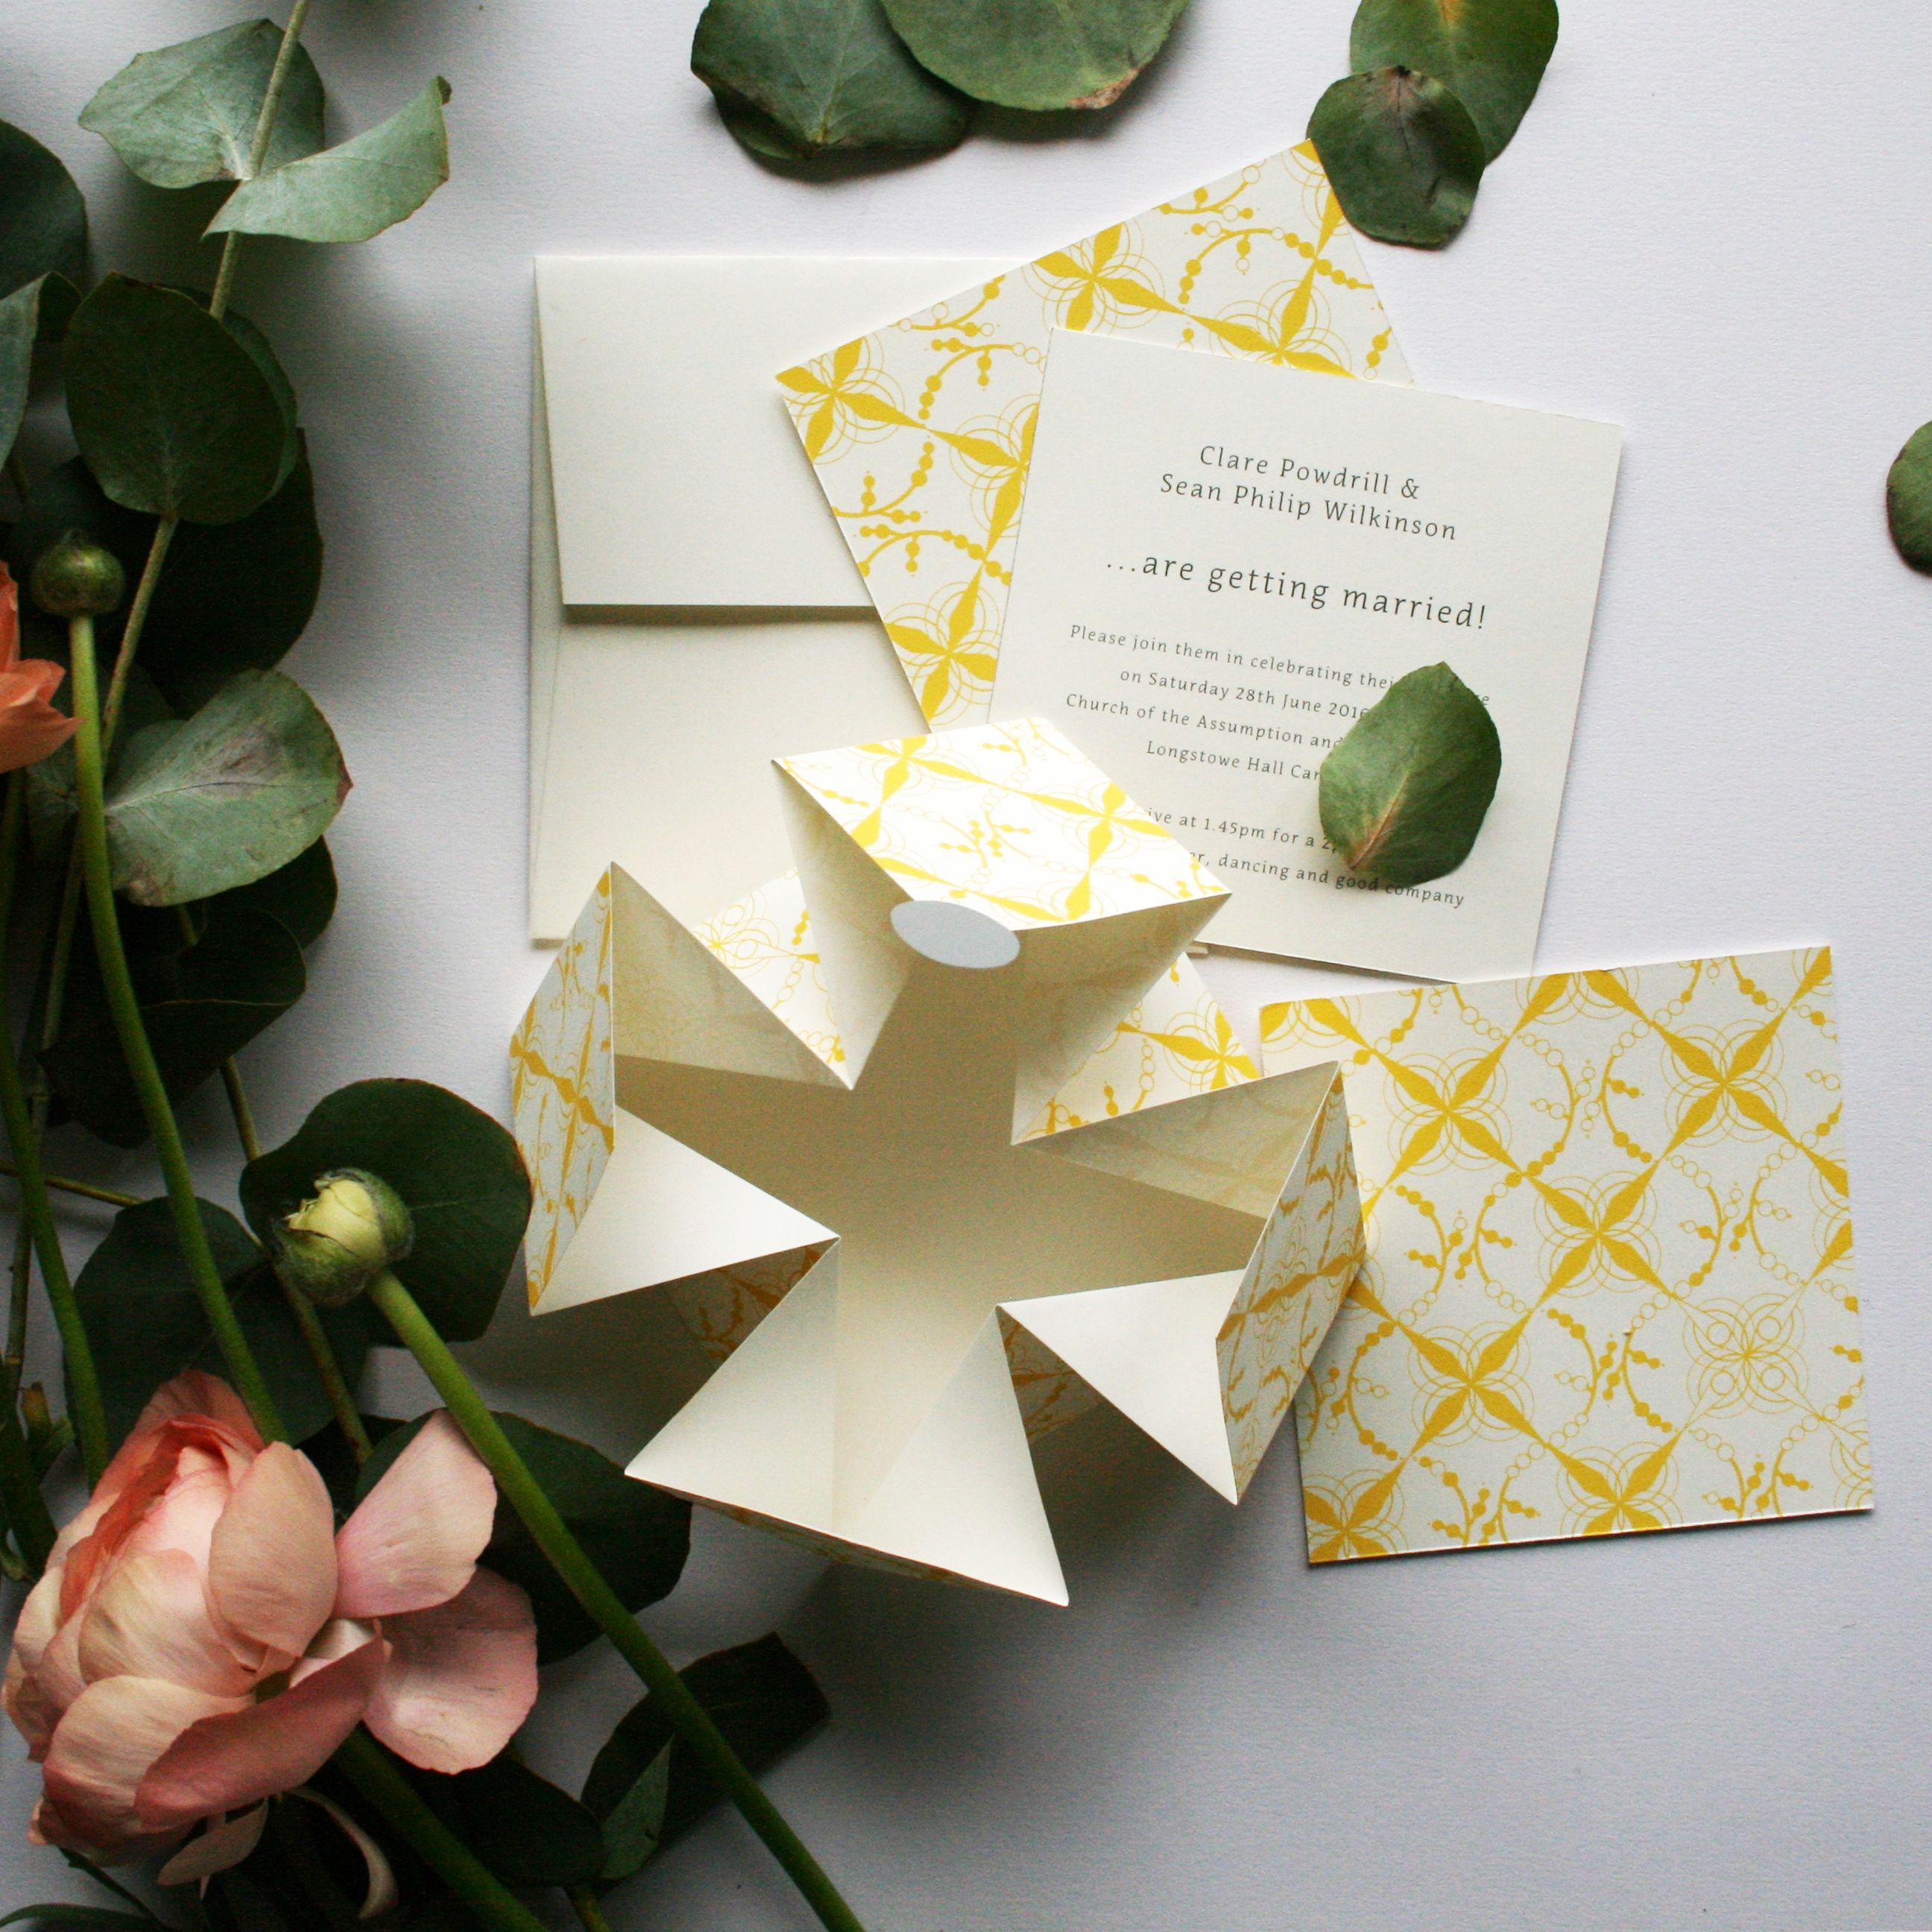 Ochre origami wedding invite | Origami | Origami wedding ... - photo#13